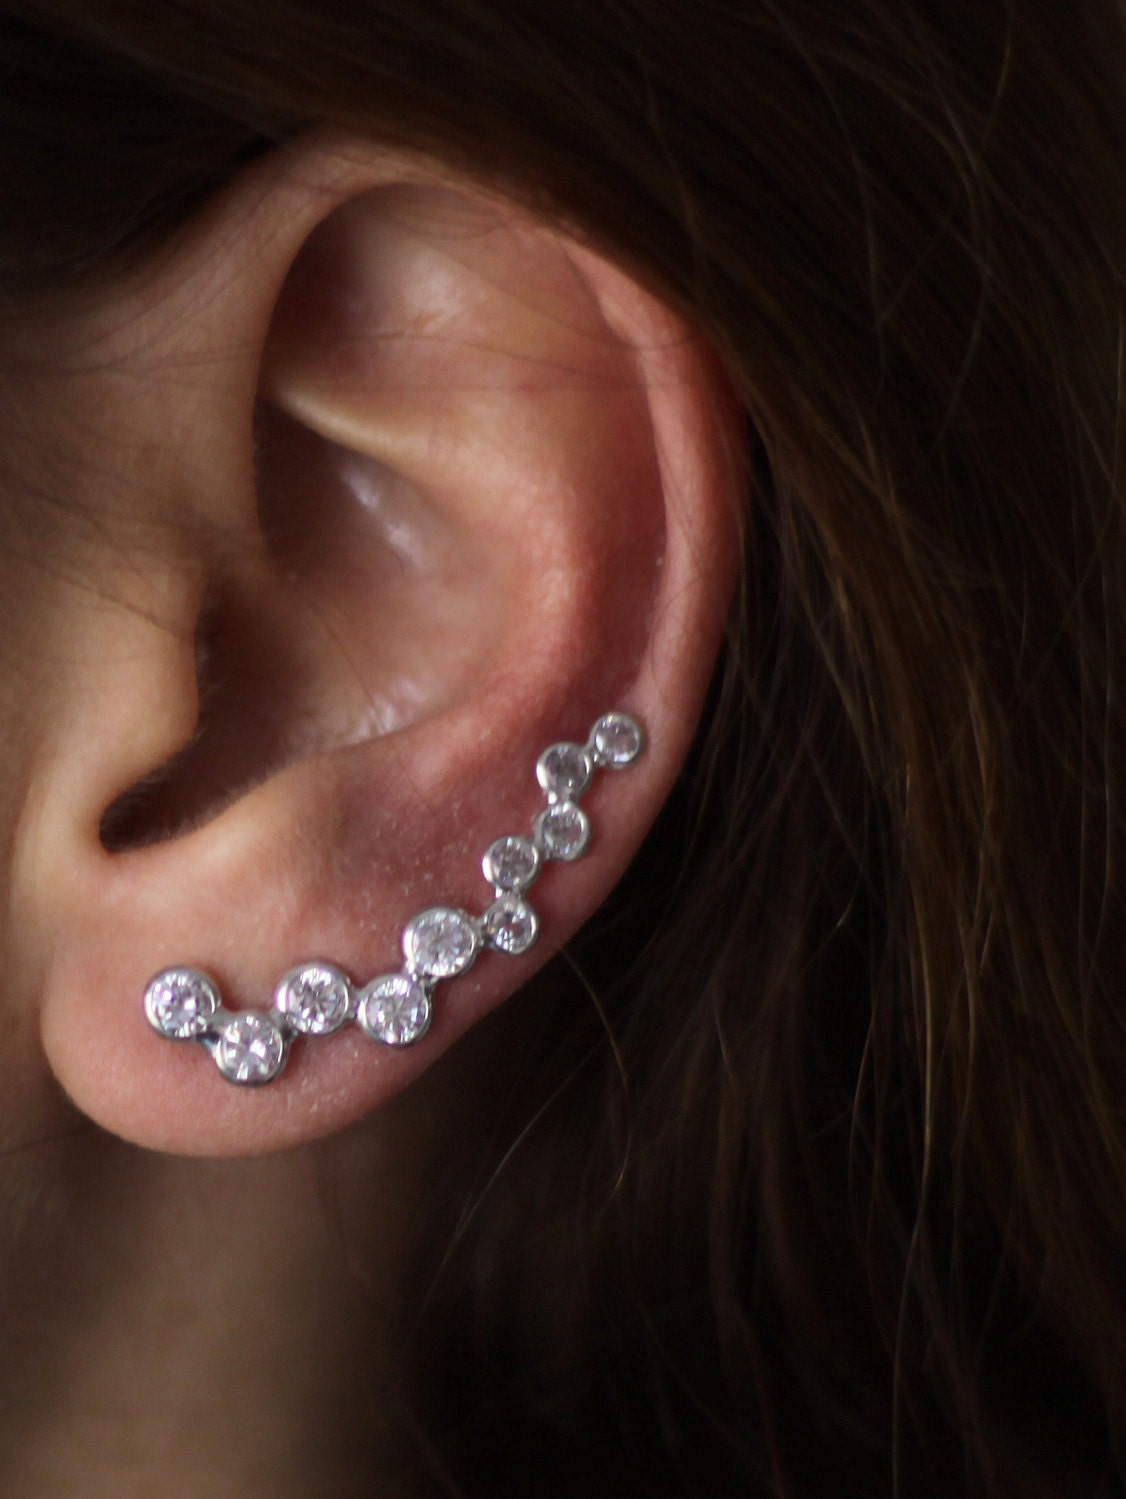 ear cuff sterling silver pair of ear cuffs minimalist. Black Bedroom Furniture Sets. Home Design Ideas